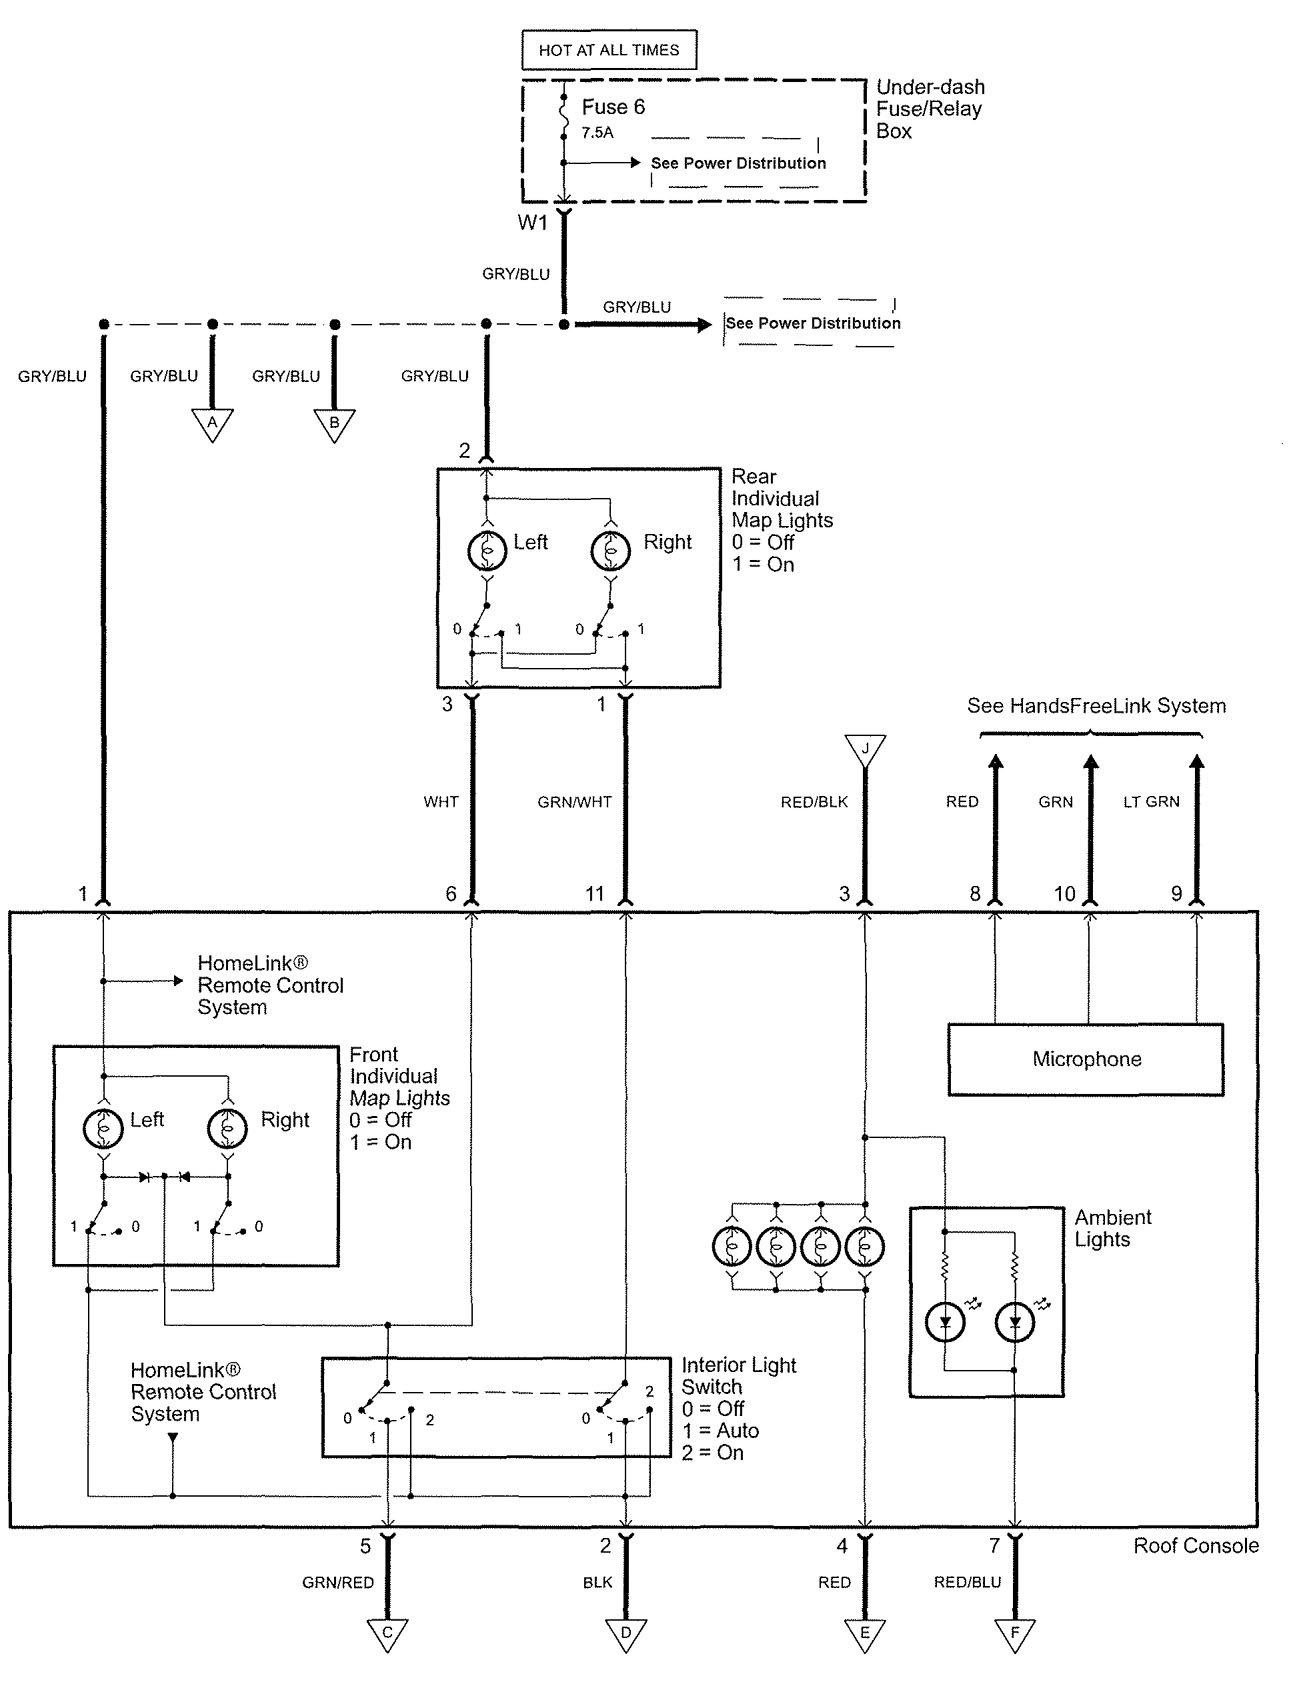 2005 ford freestar wiring diagram schematics wiring diagrams u2022 rh seniorlivinguniversity co 2005 ford freestyle stereo wiring diagram 2005 ford freestyle alternator wiring diagram